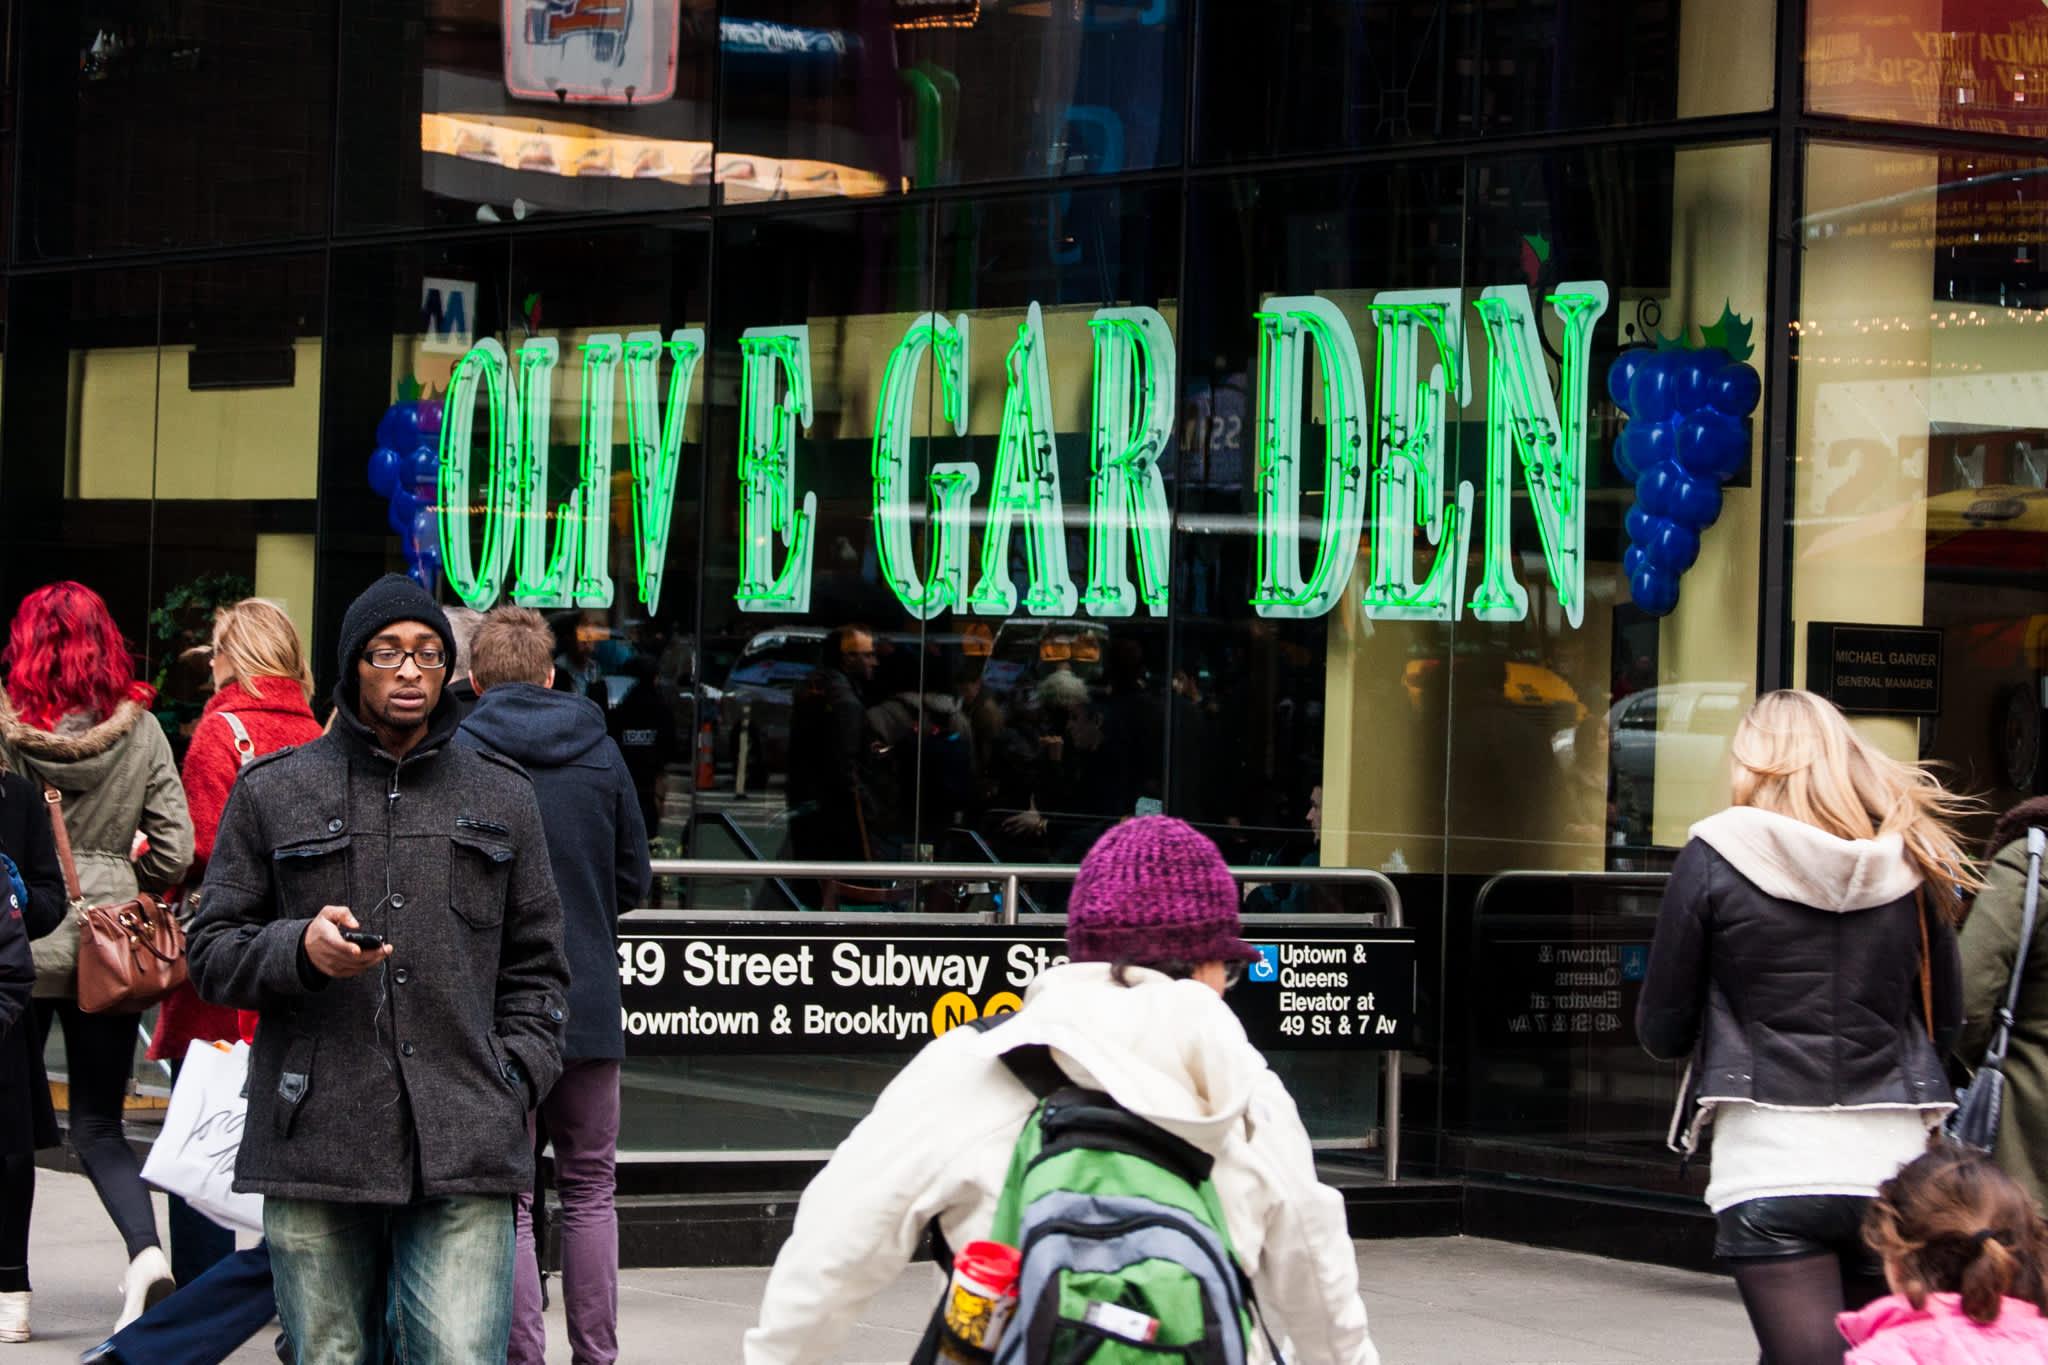 Stocks making the biggest moves premarket: Darden Restaurants, BlackBerry, Salesforce and others - CNBC